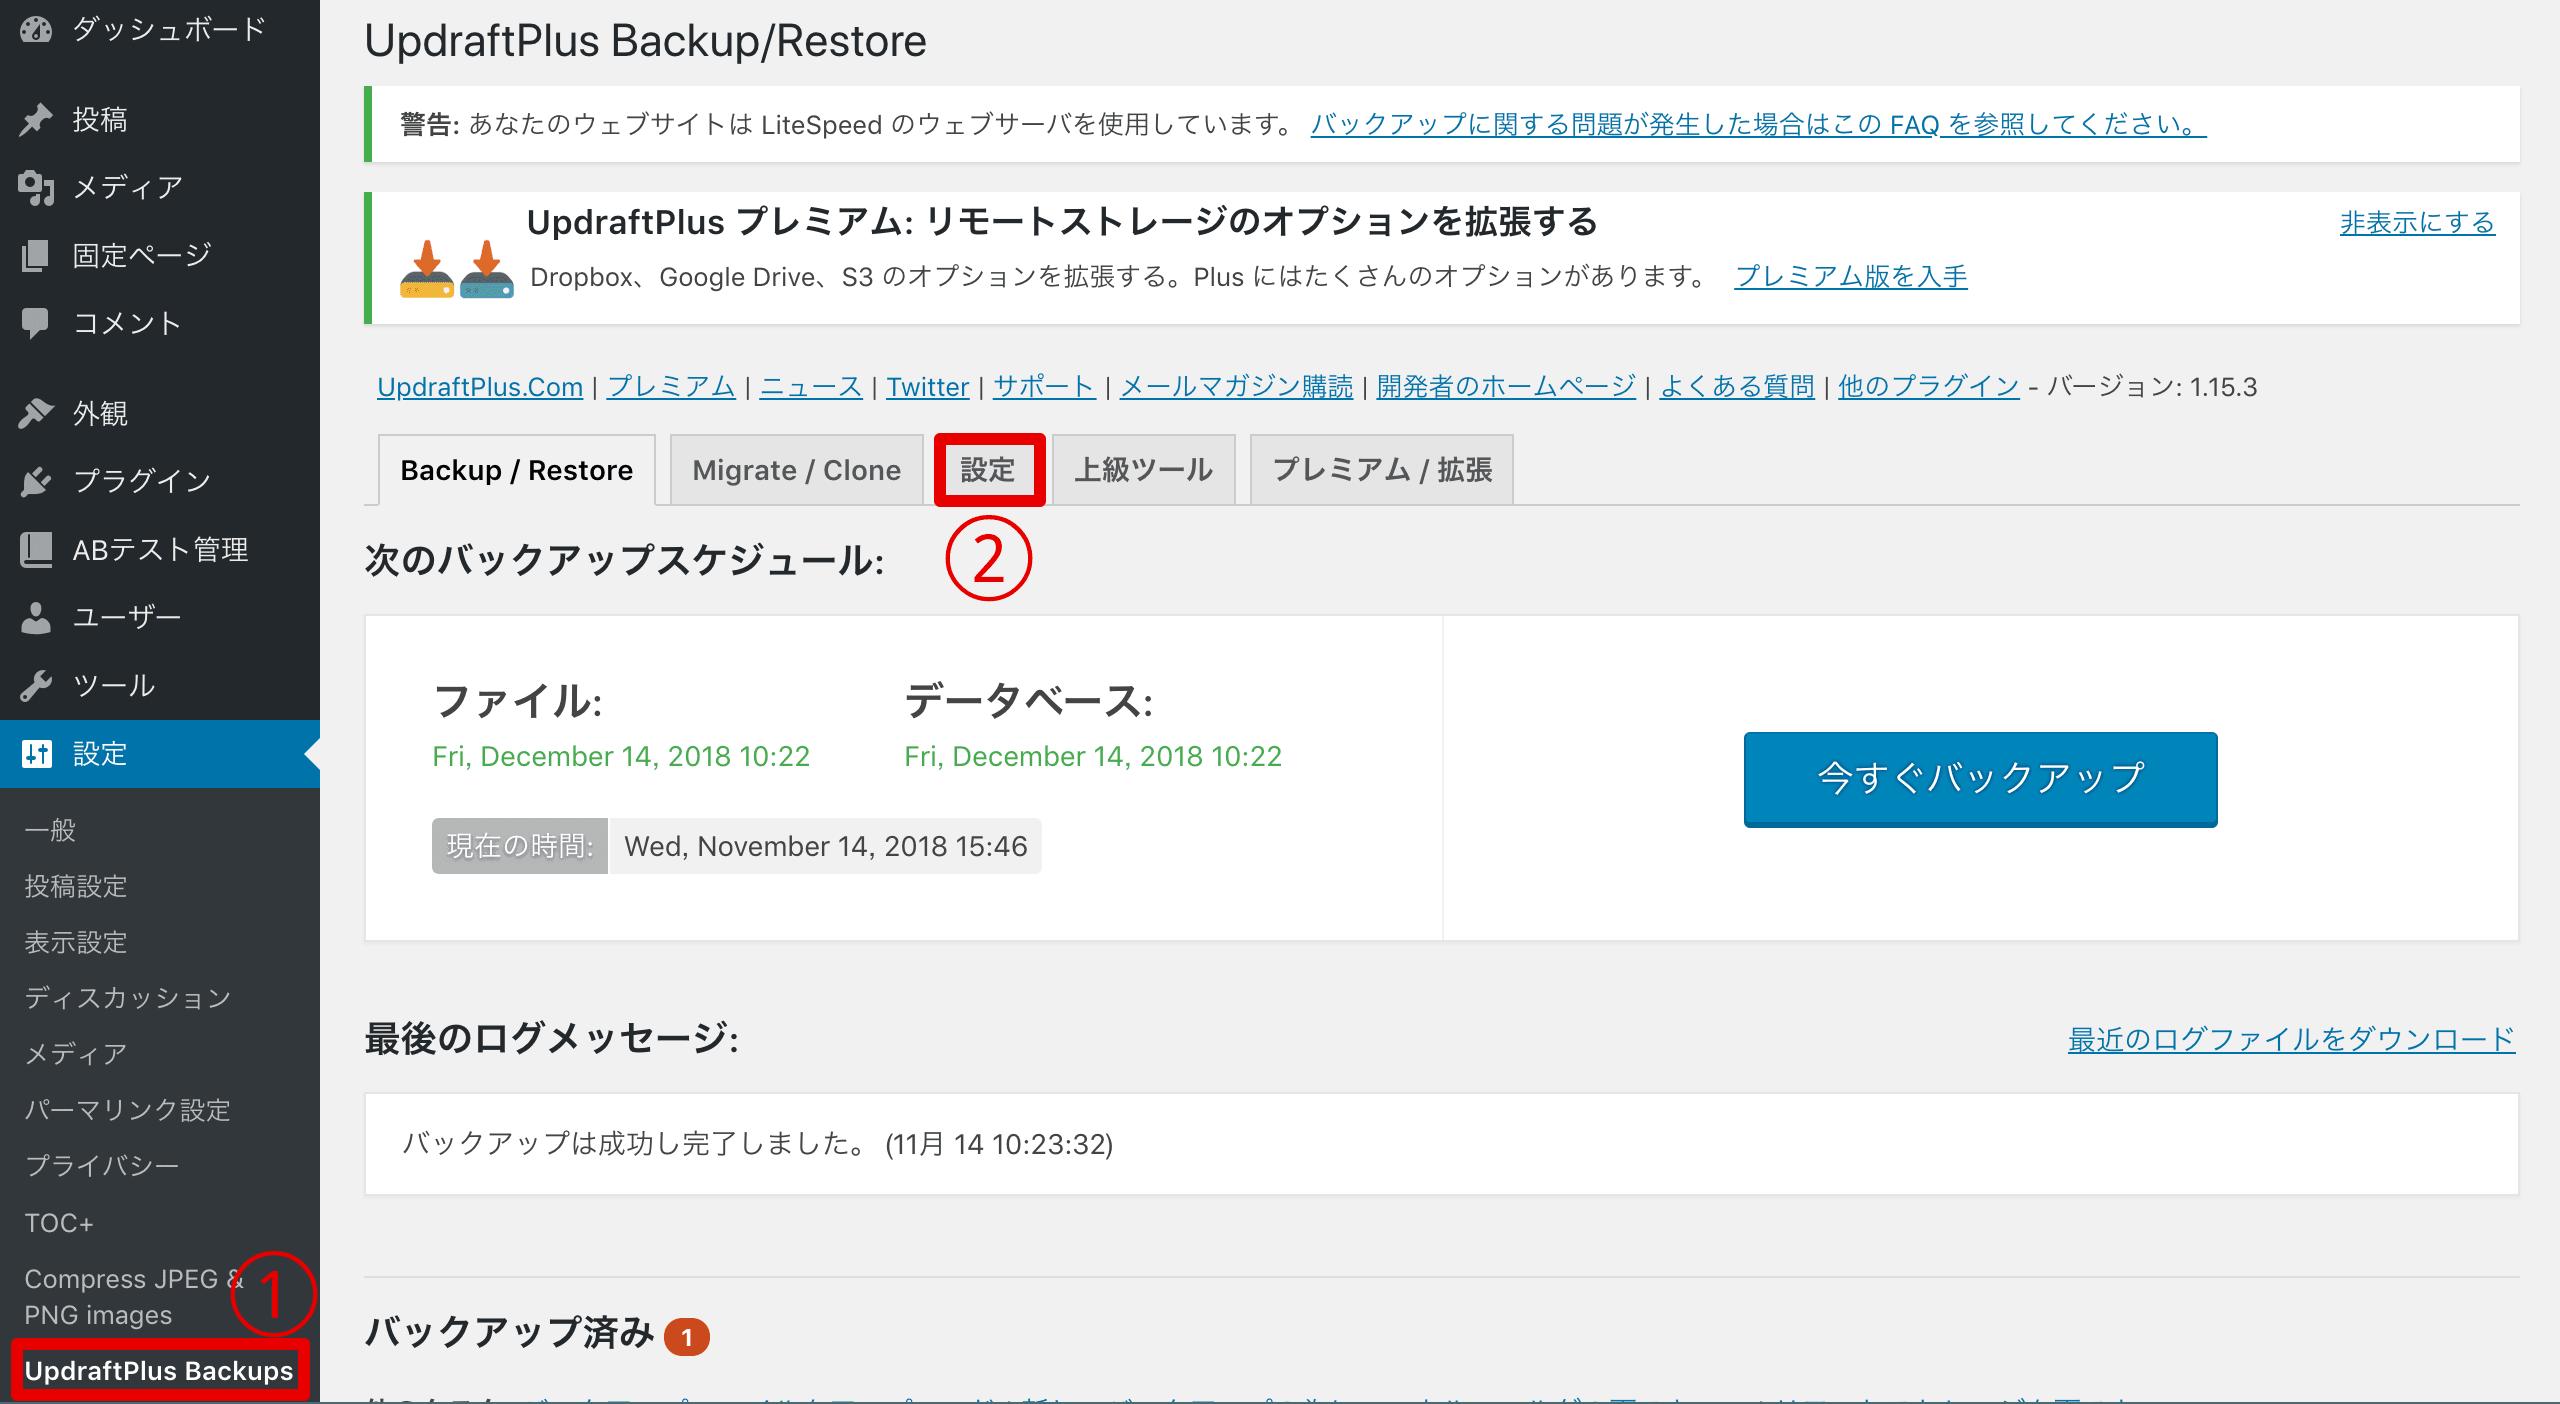 UpdraftPlus- Backup/Restore設定